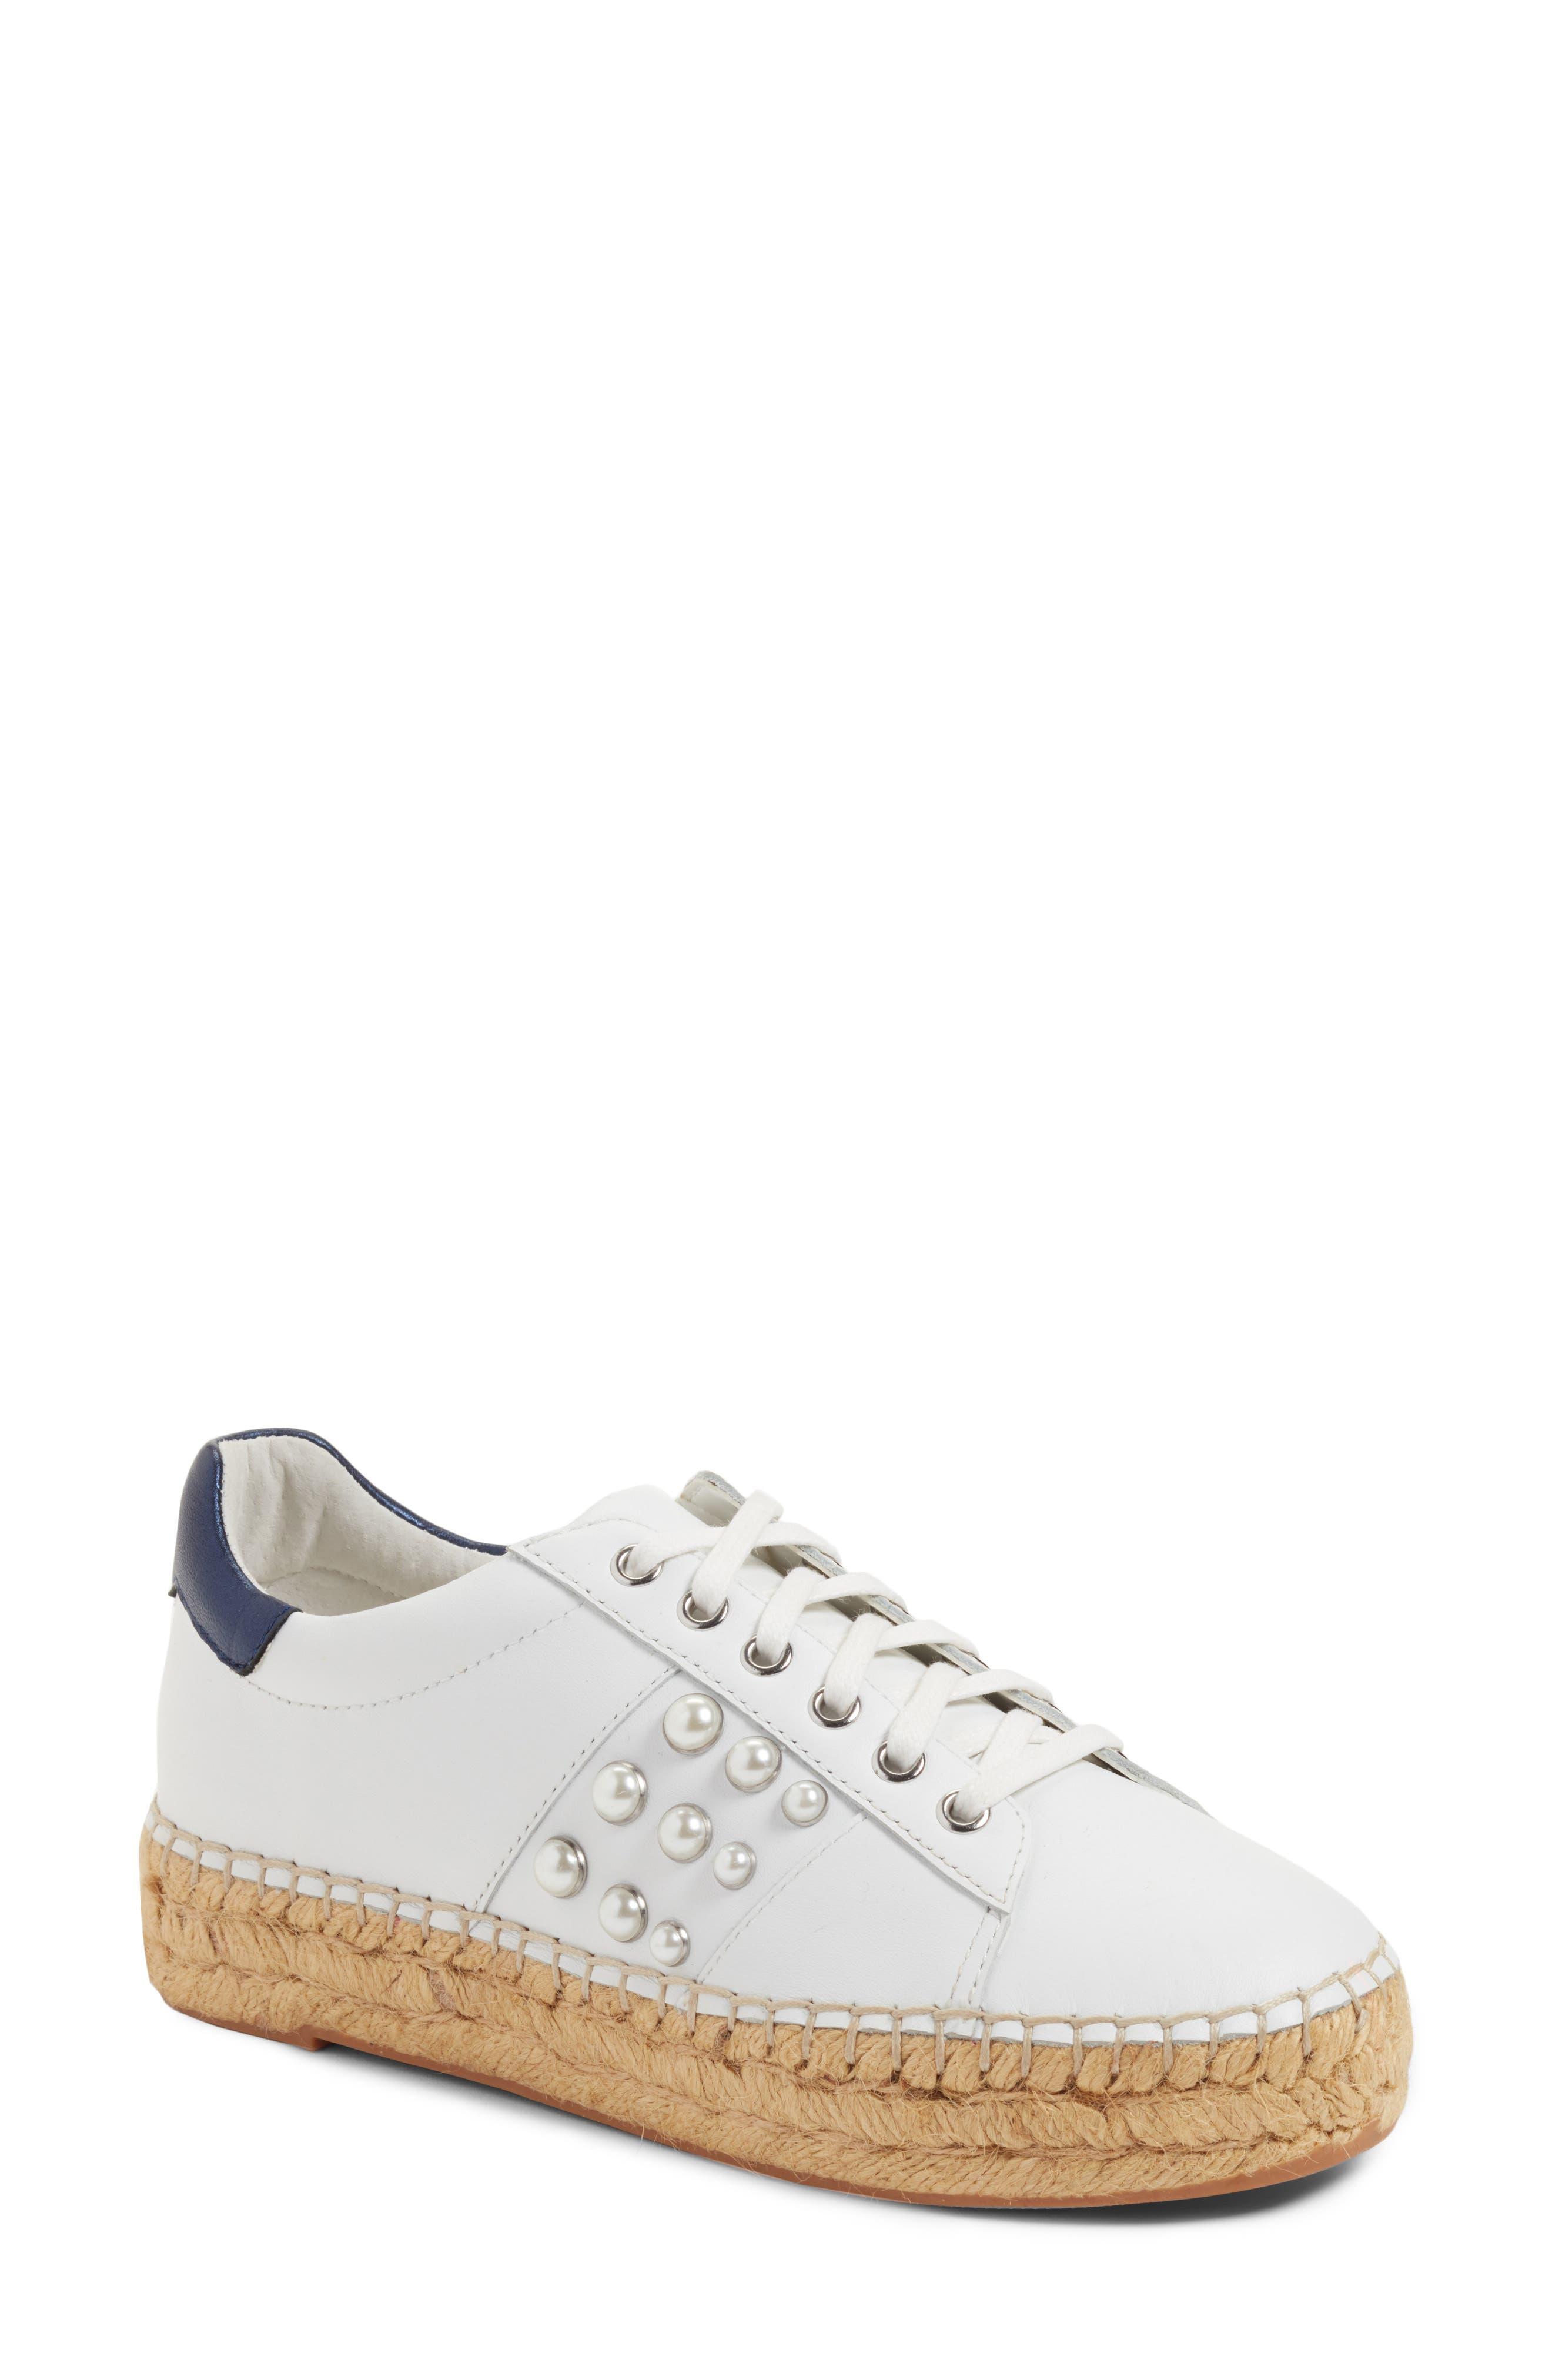 Marge Espadrille Platform Sneaker,                         Main,                         color, White/ Navy Leather